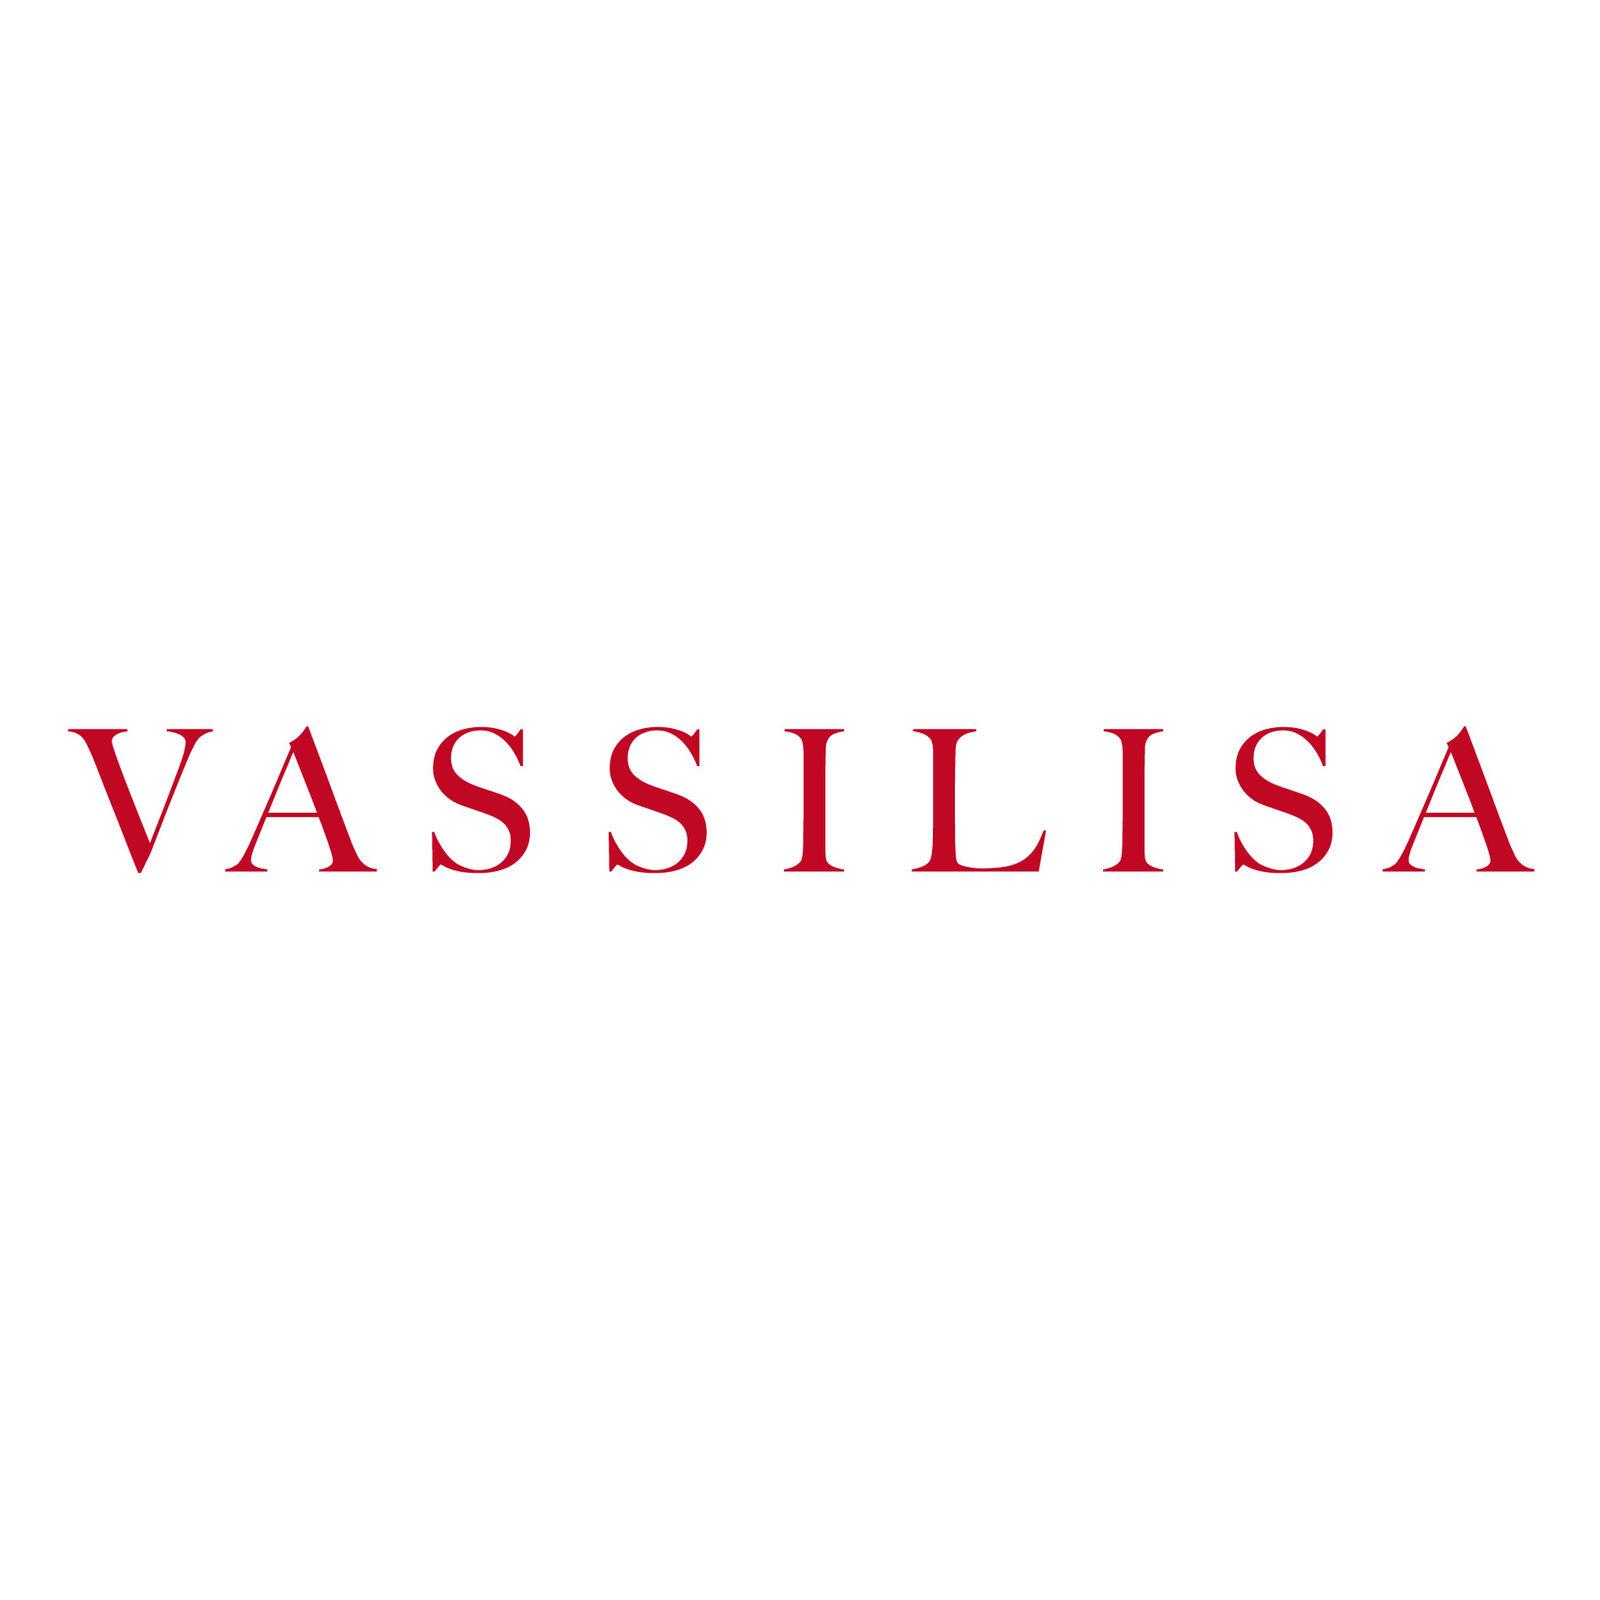 VASSILISA (Bild 1)